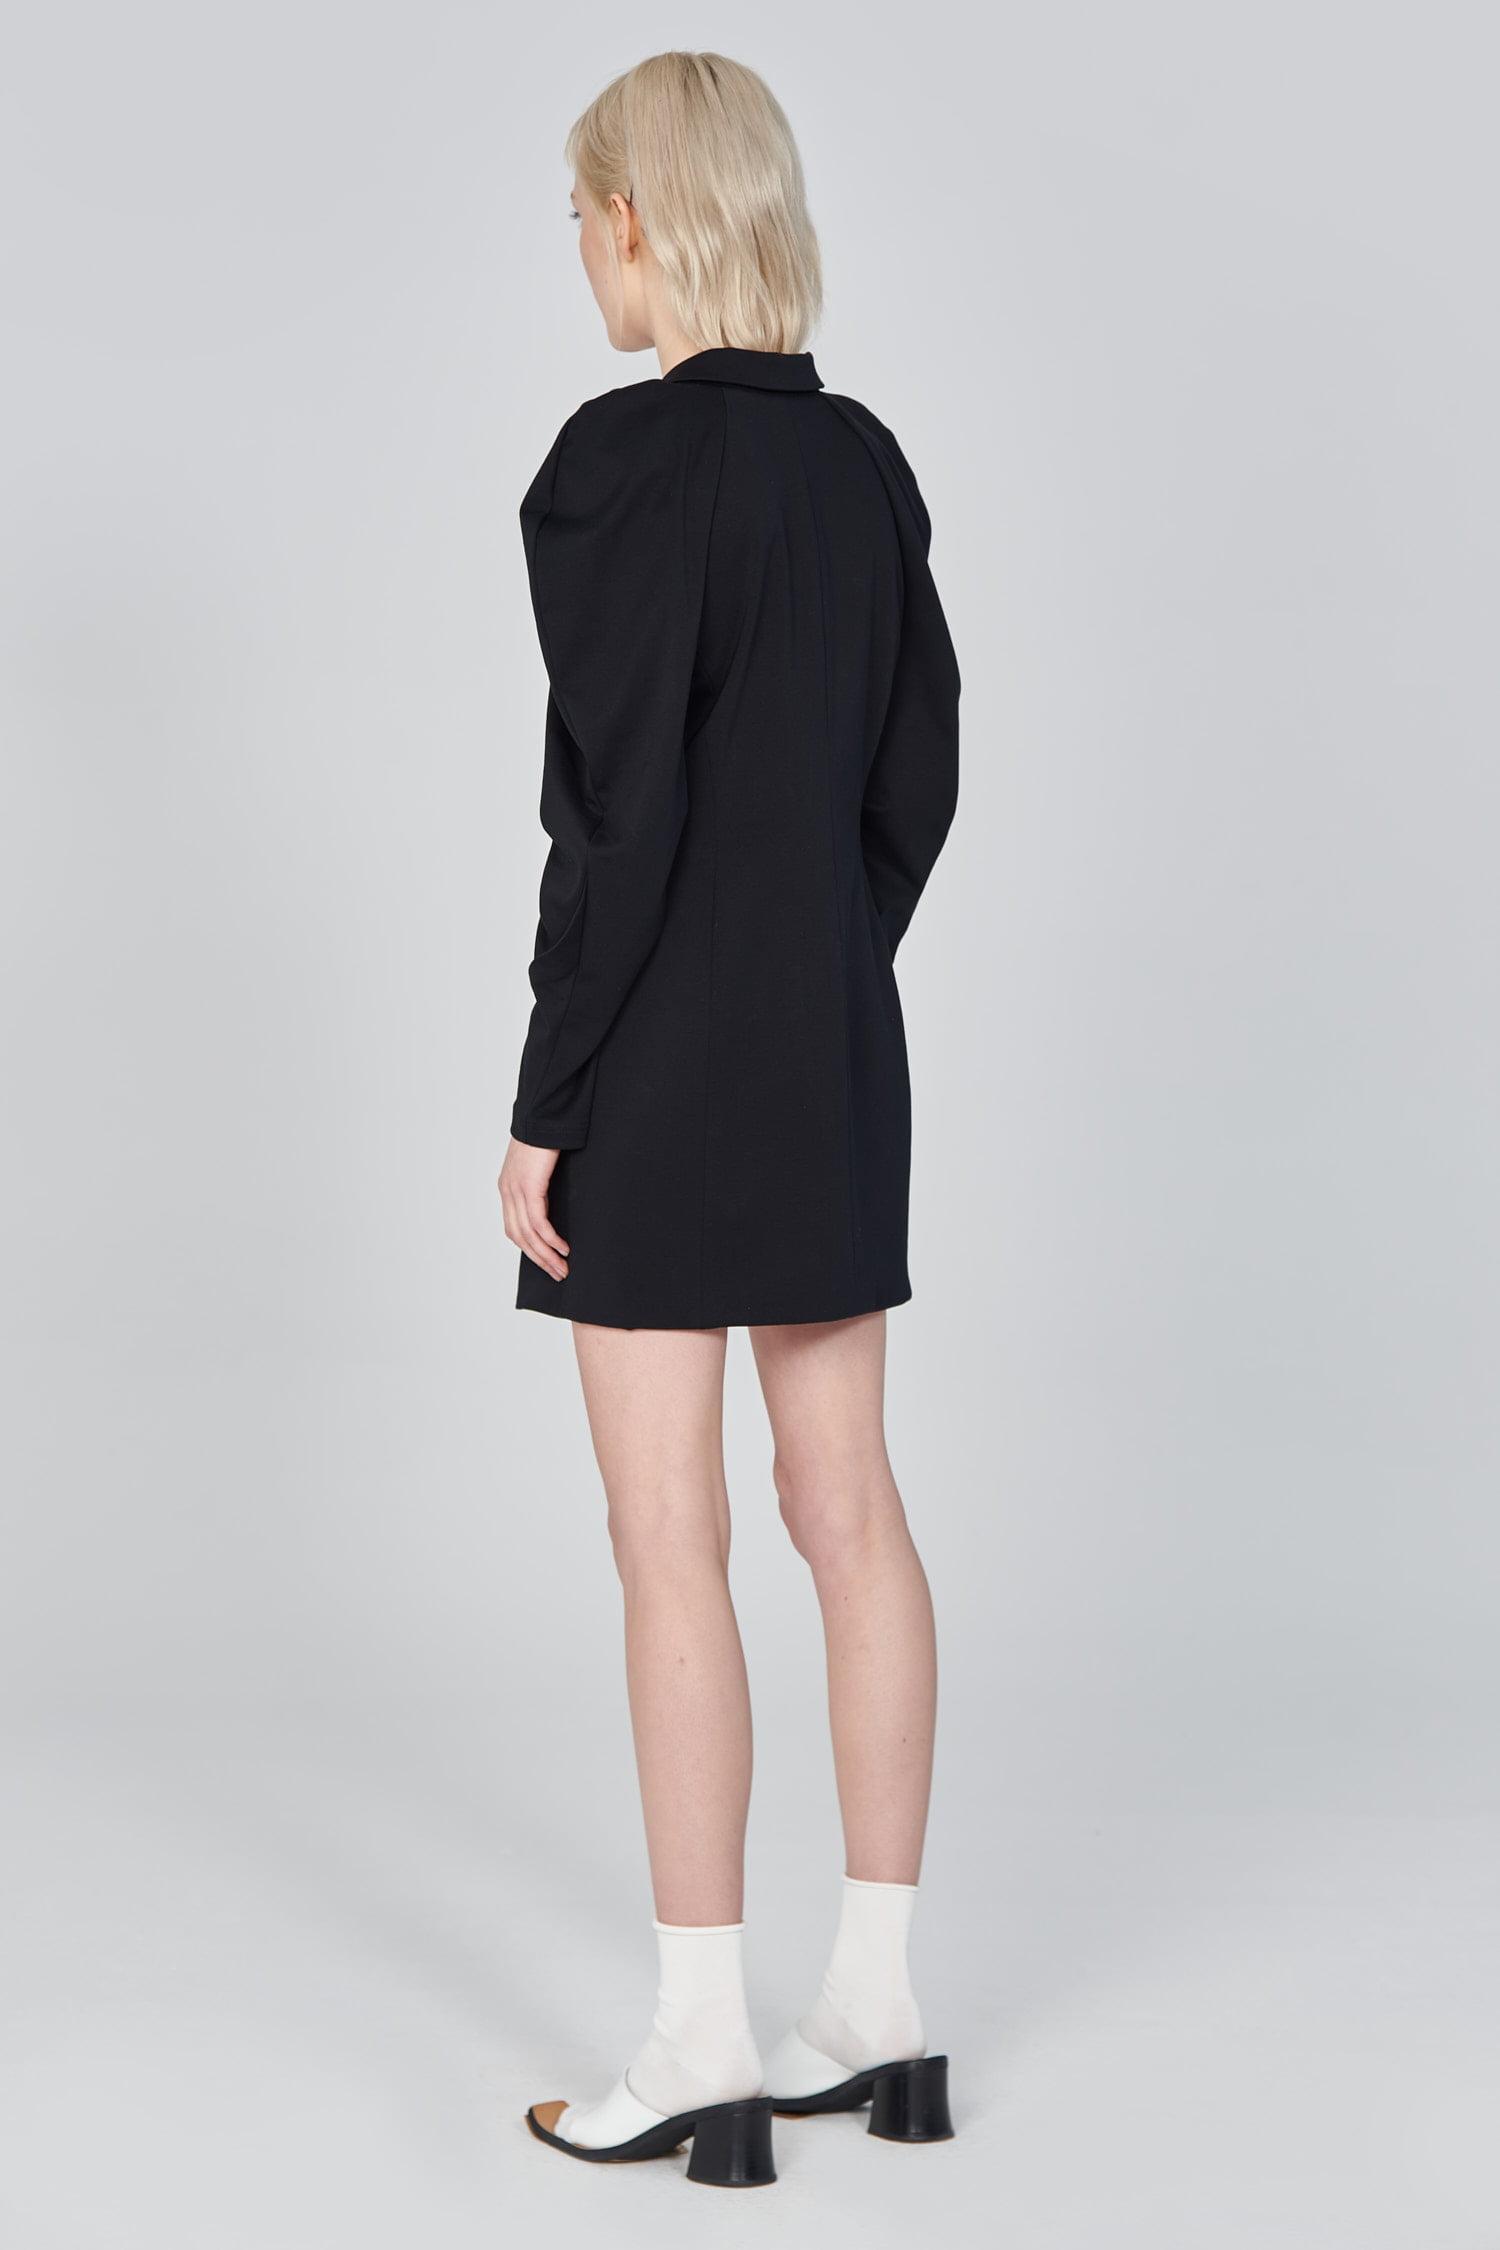 Acephala Ss21 Black Long Tailored Jacket Back Side Top Only